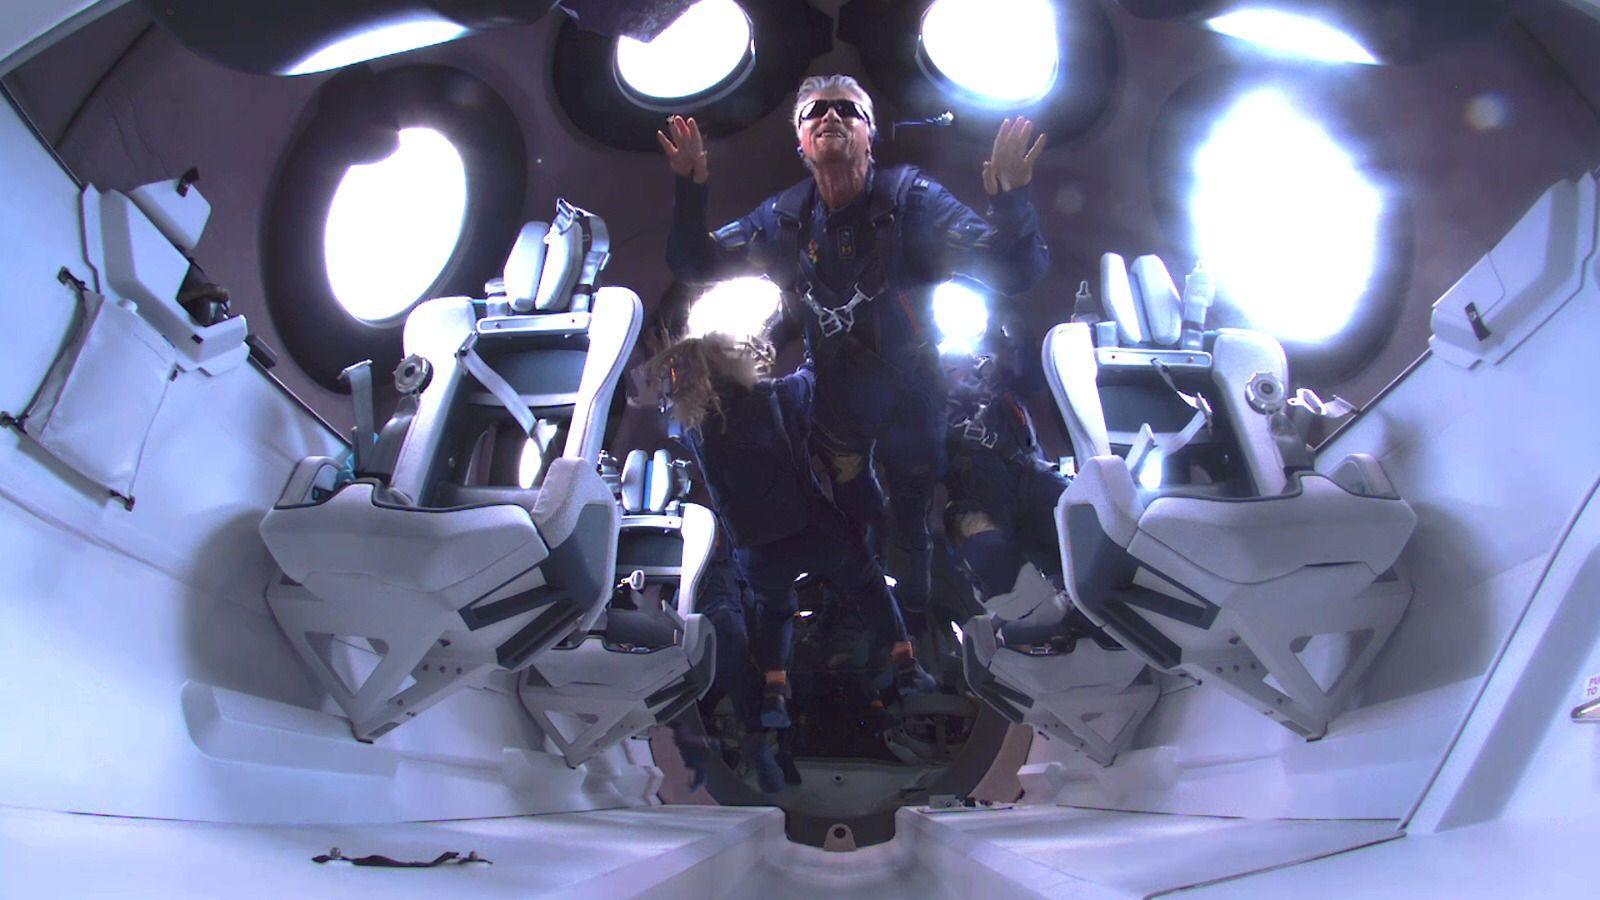 Richard Branson floats in microgravity inside Virgin Galactic's spaceplane.